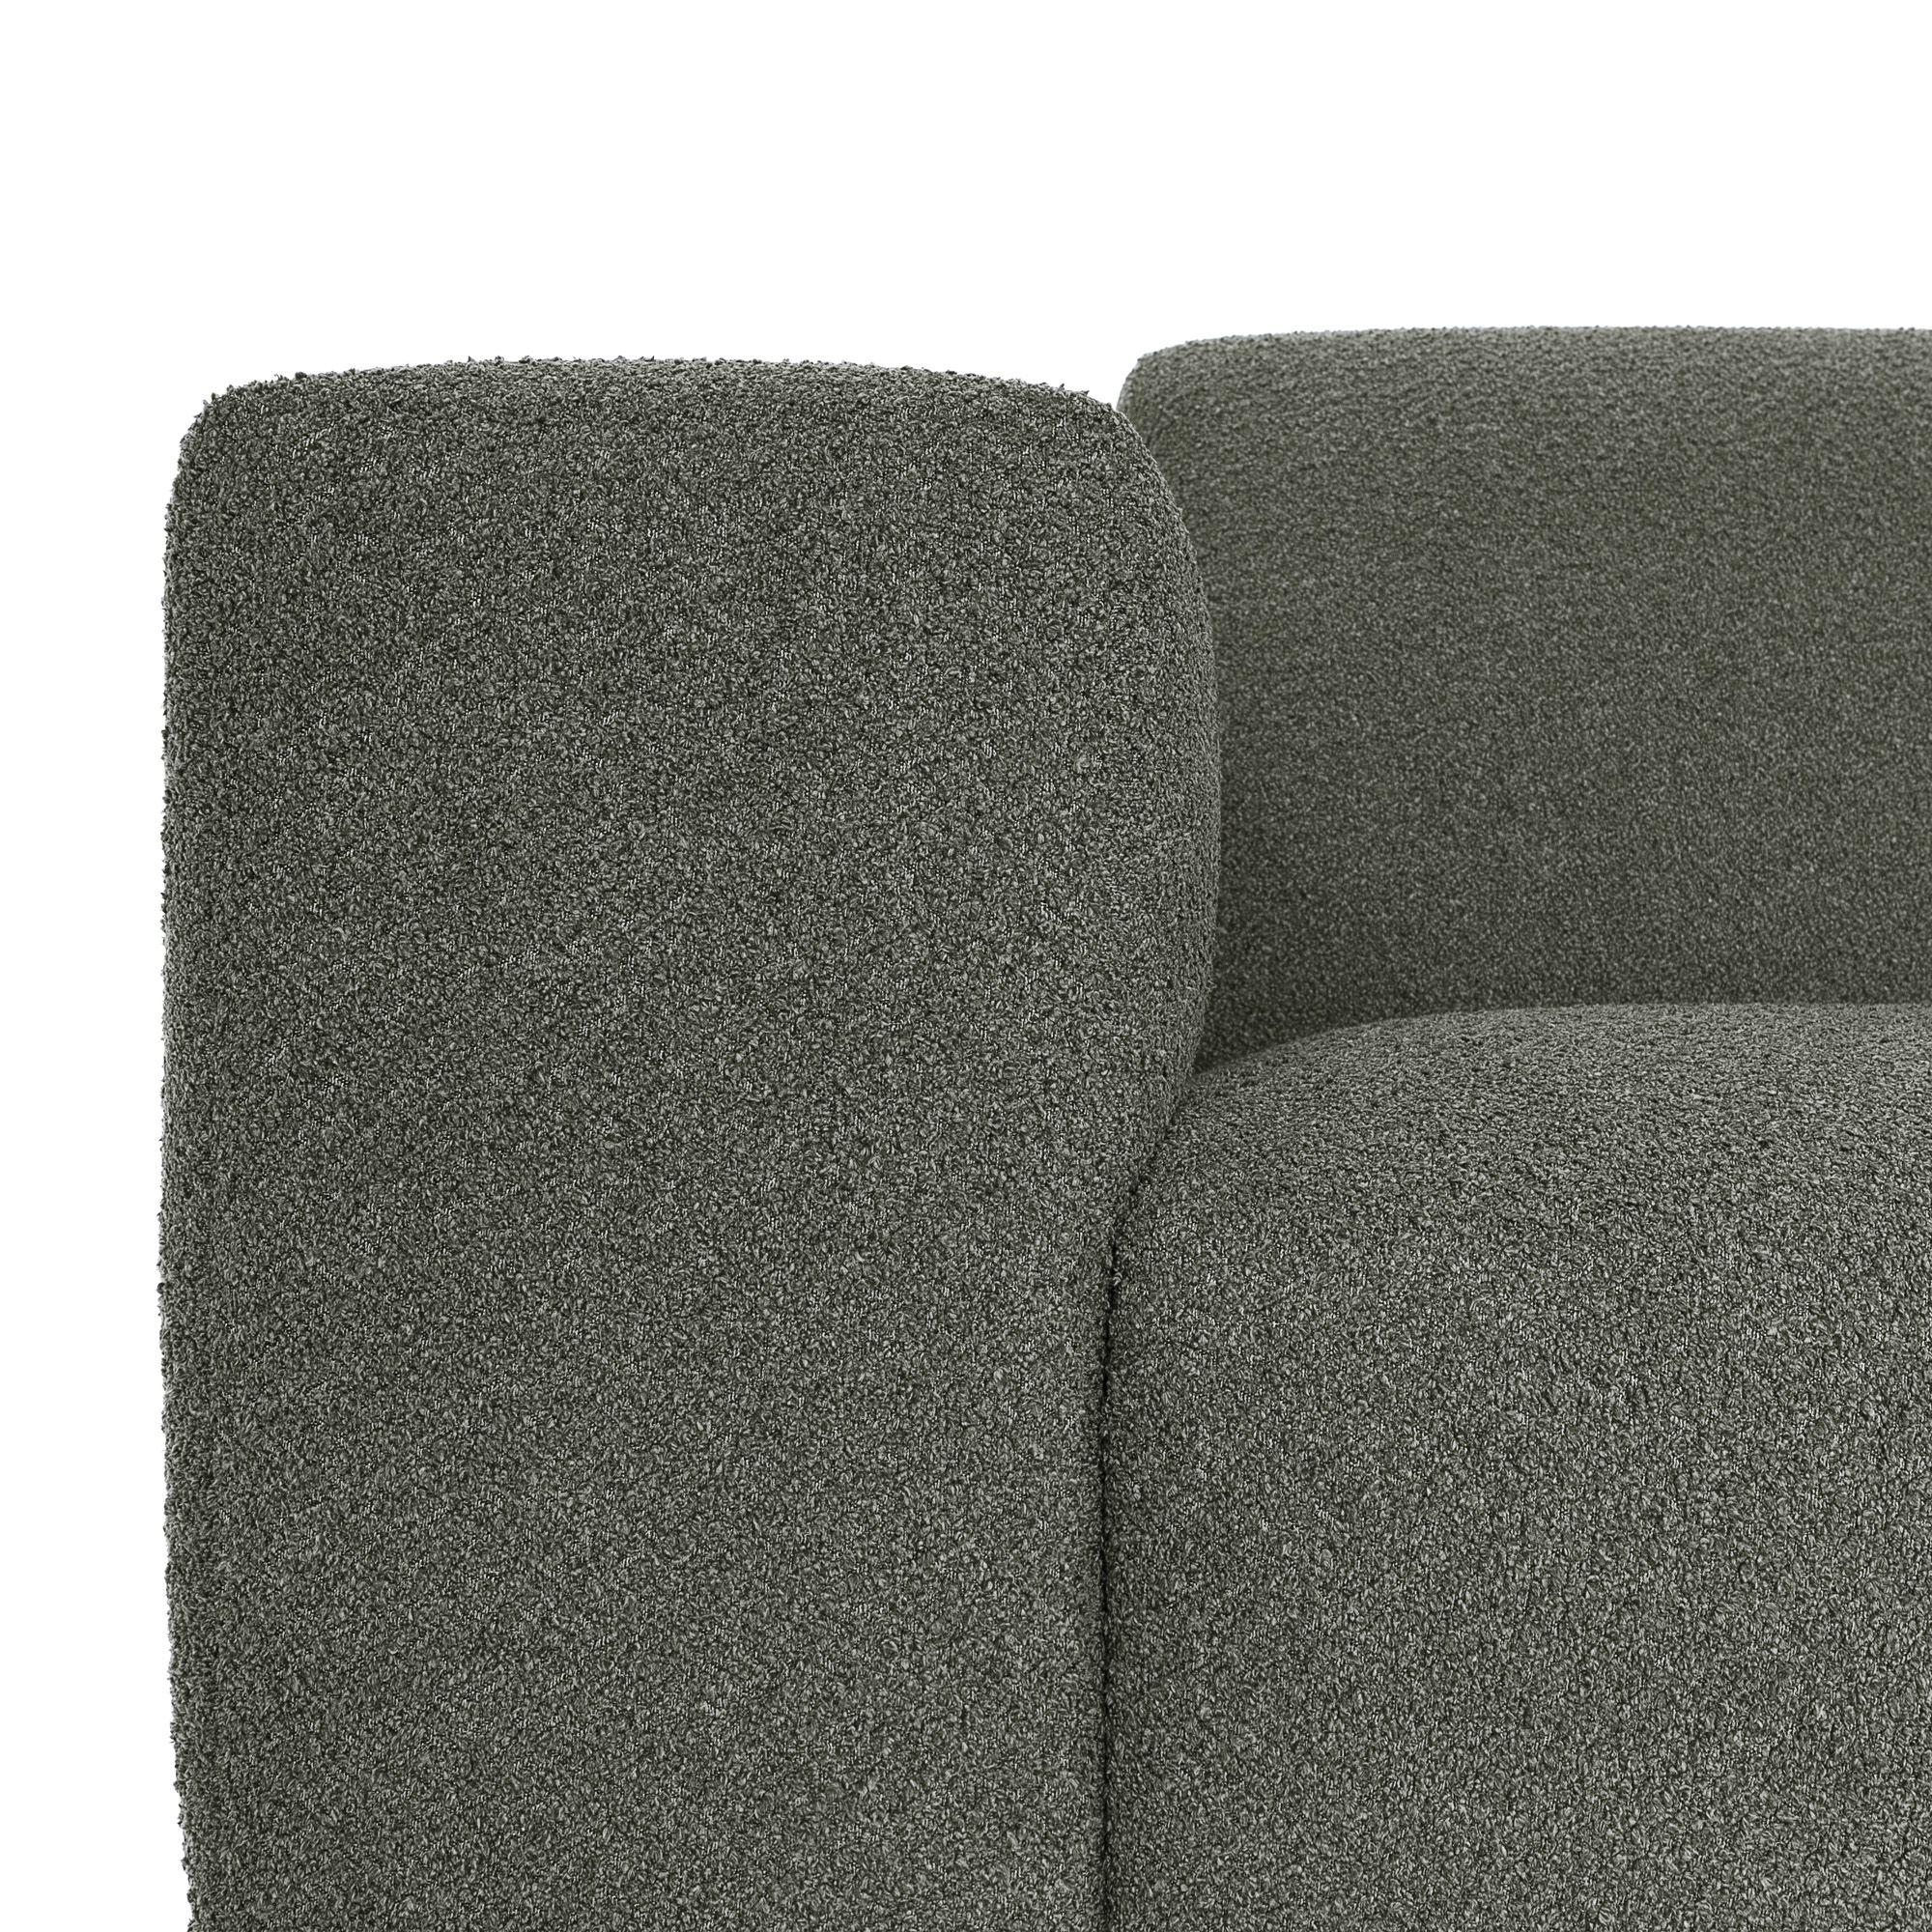 Astounding George 2 5 Zitsbank Groen Dailytribune Chair Design For Home Dailytribuneorg